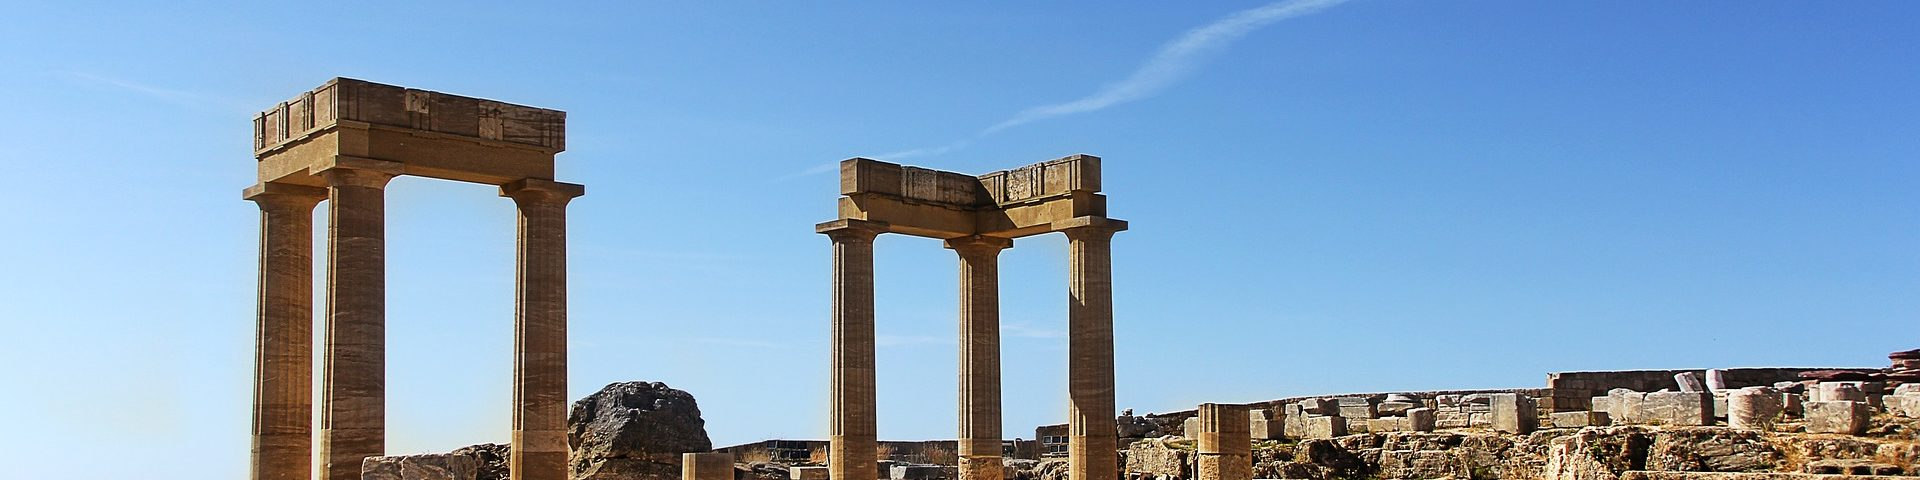 Griechenland, Rhodos, Akropolis